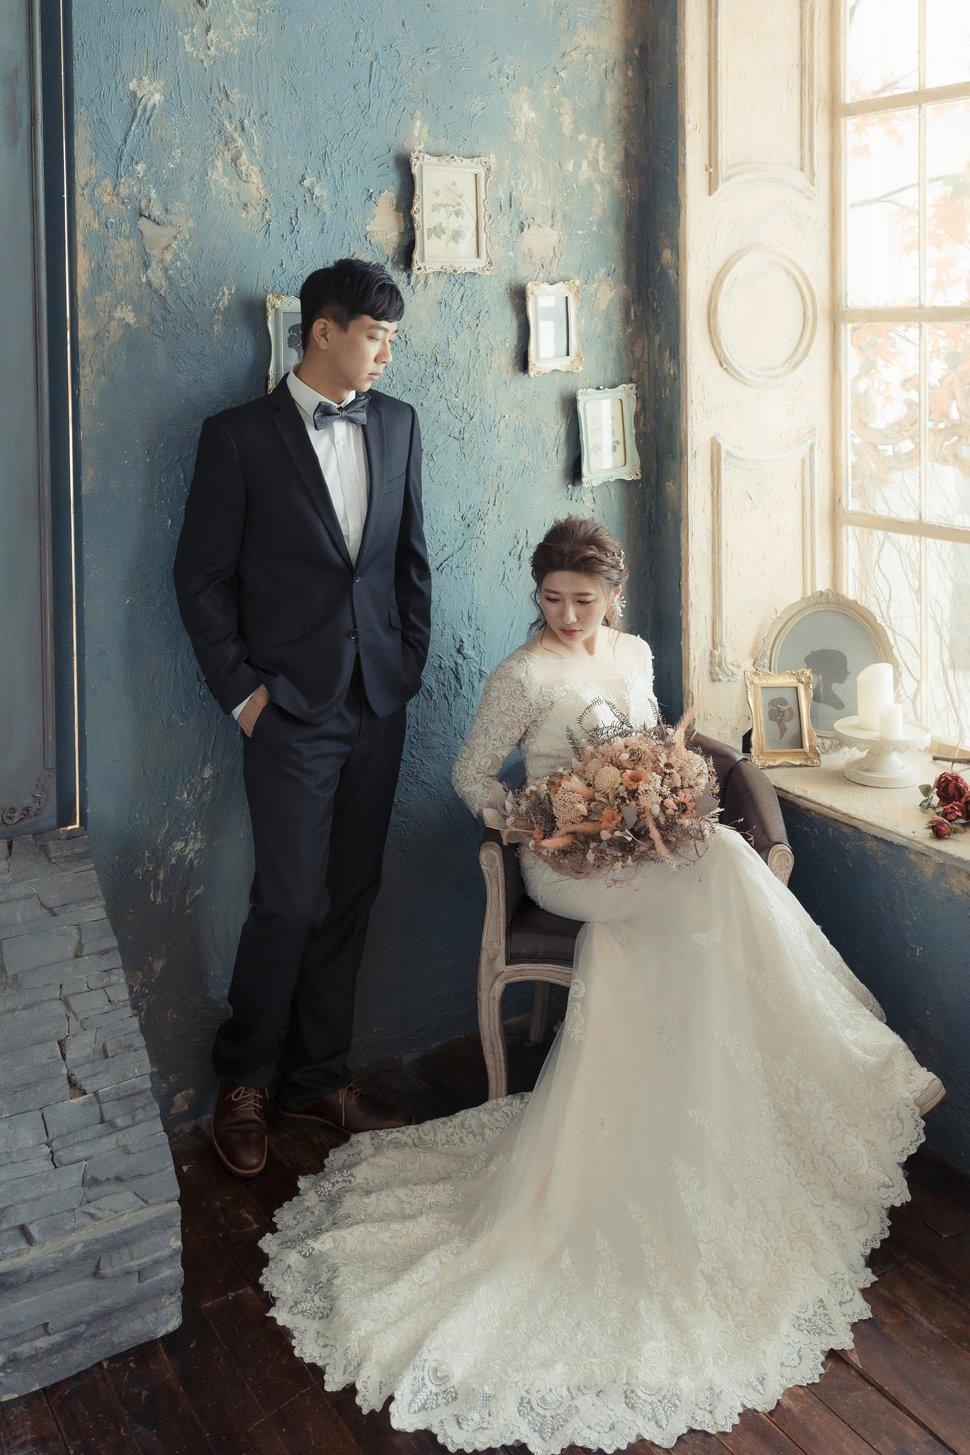 Khalil Chou(個性雜誌)-136 - Khalil Chou (凱勒·周)《結婚吧》